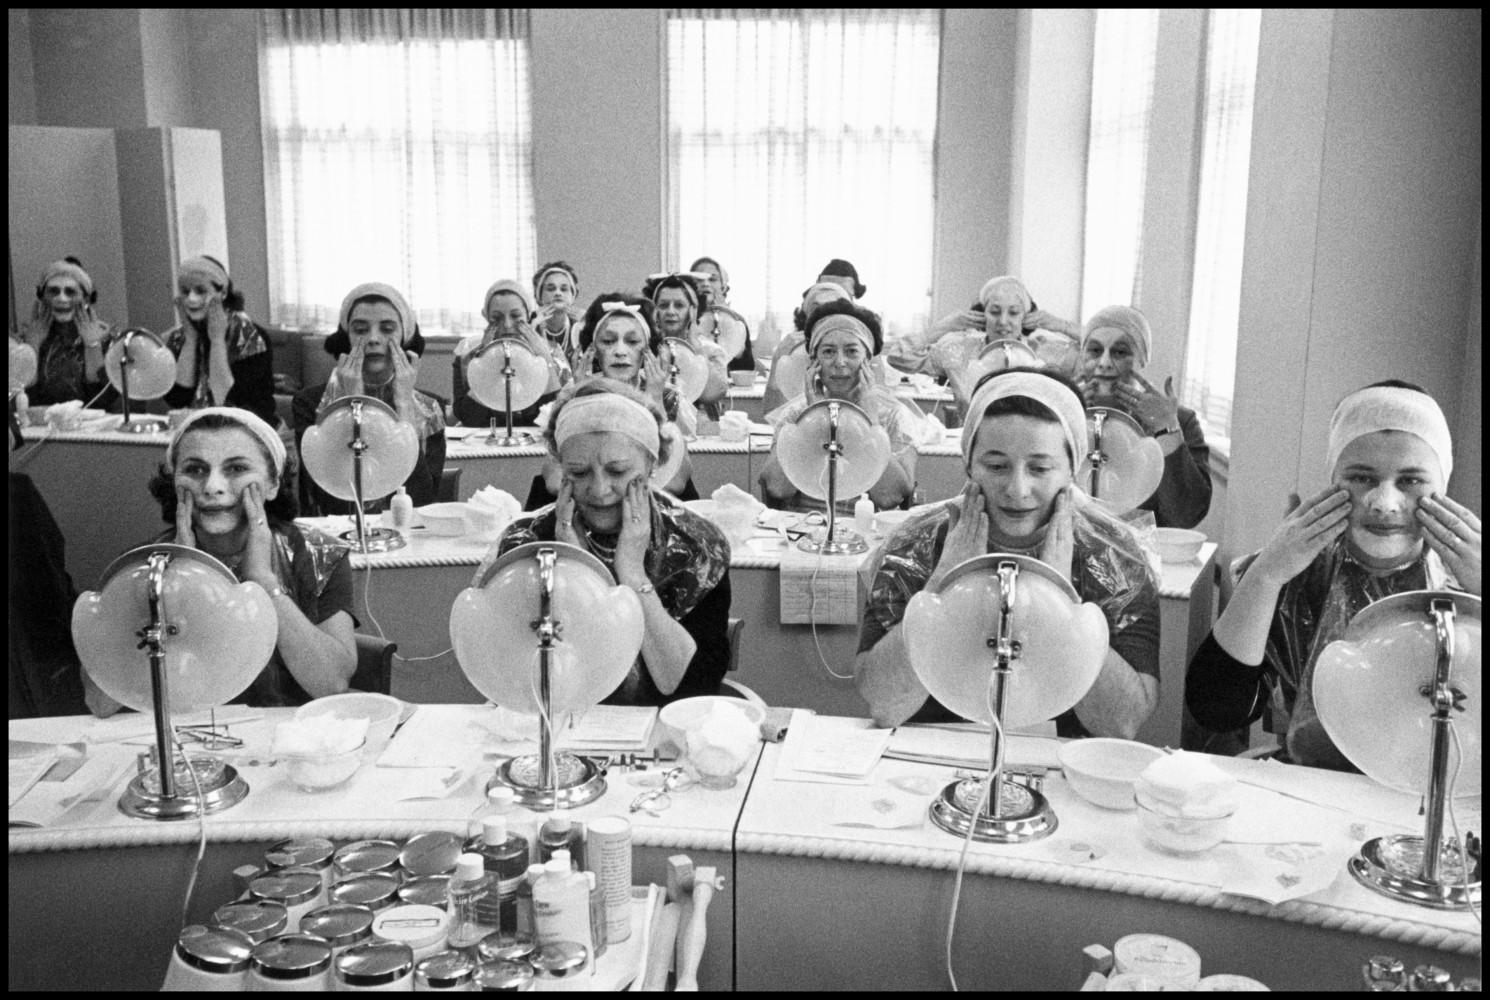 Inside Madame Helena Rubinstein's Beauty School • Inge Morath